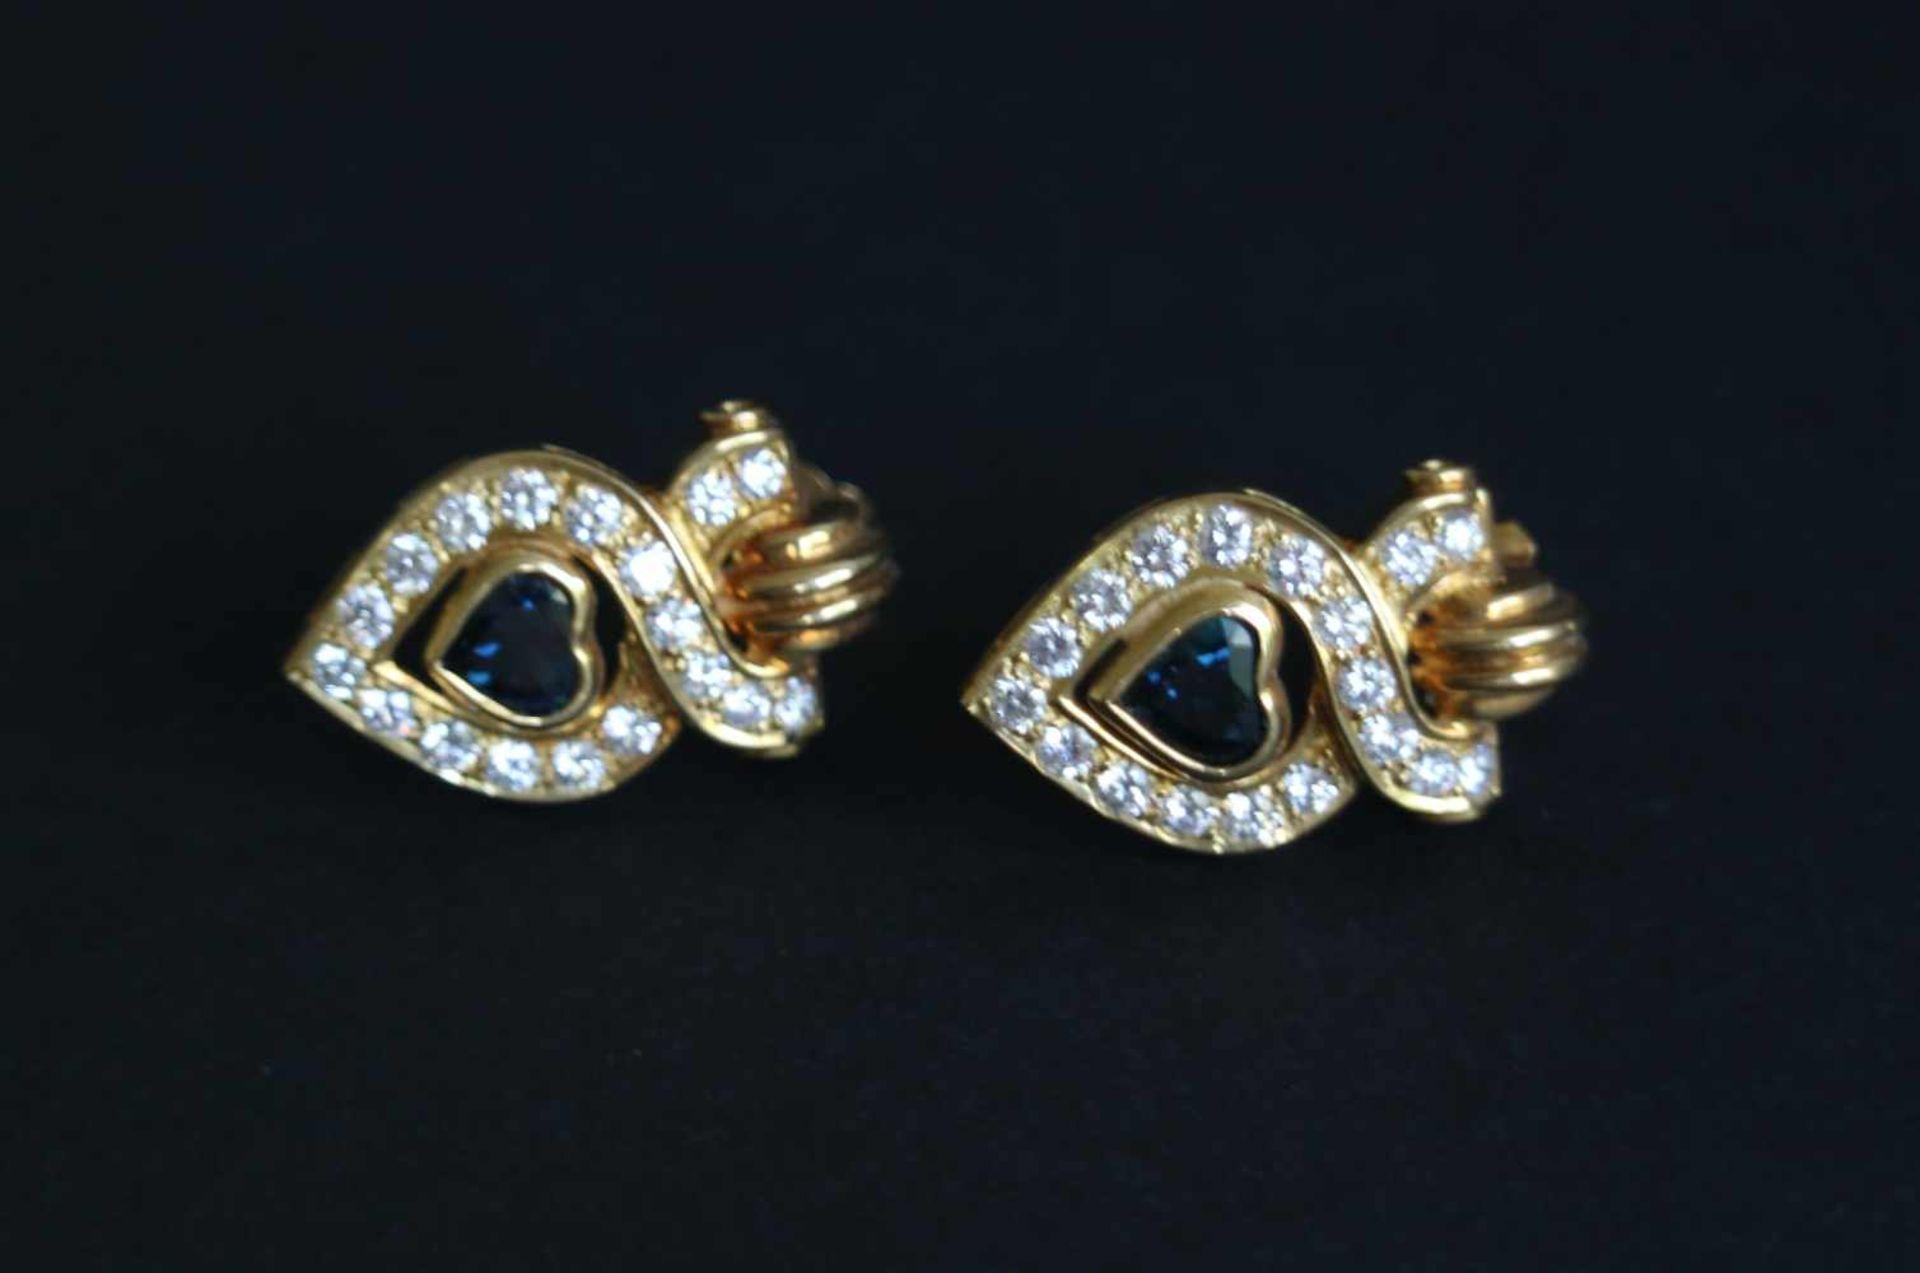 Los 942 - Earrings with blue sapphire and diamond, earrings 18 kt 11.5 gr, 2 sapphires in heart shape, 56 x